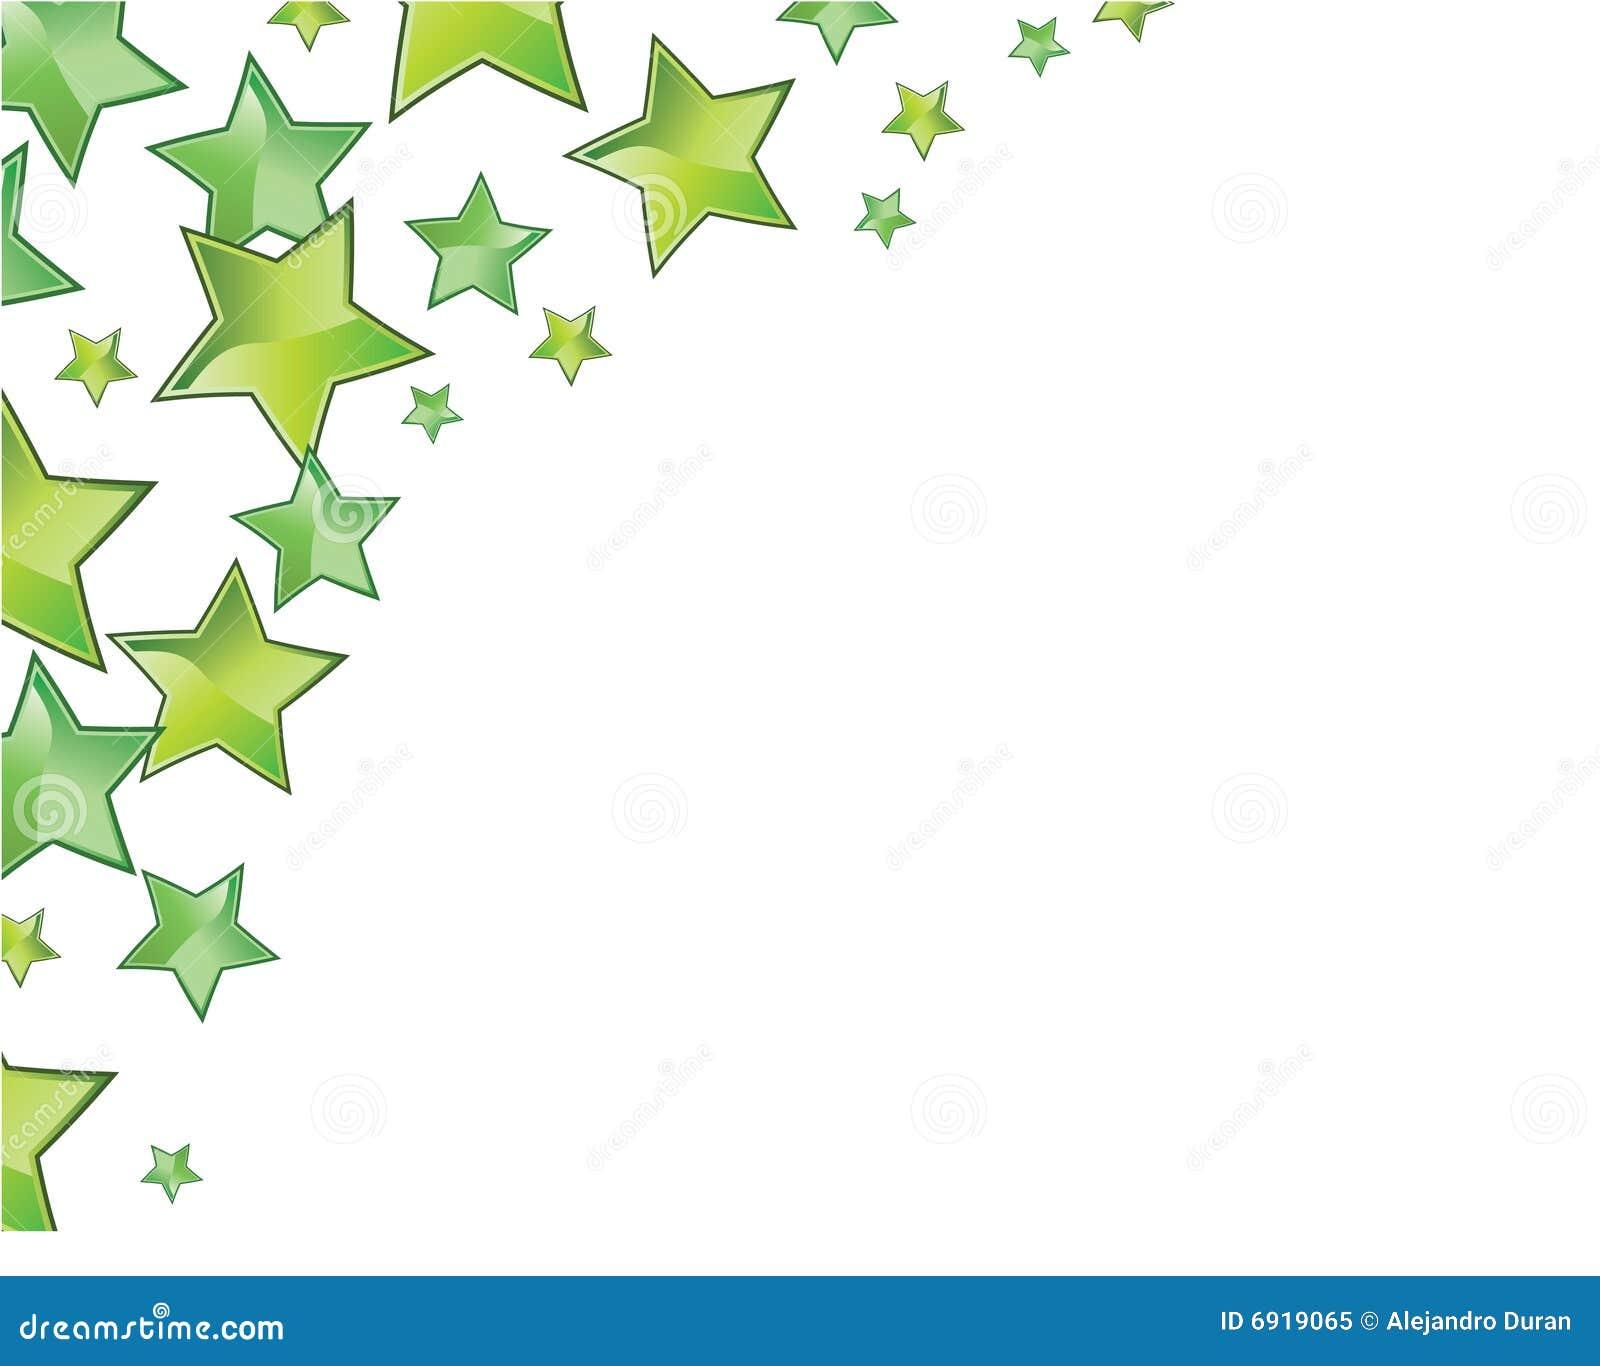 Vector graphics of pale blue snowflake symbol  Public